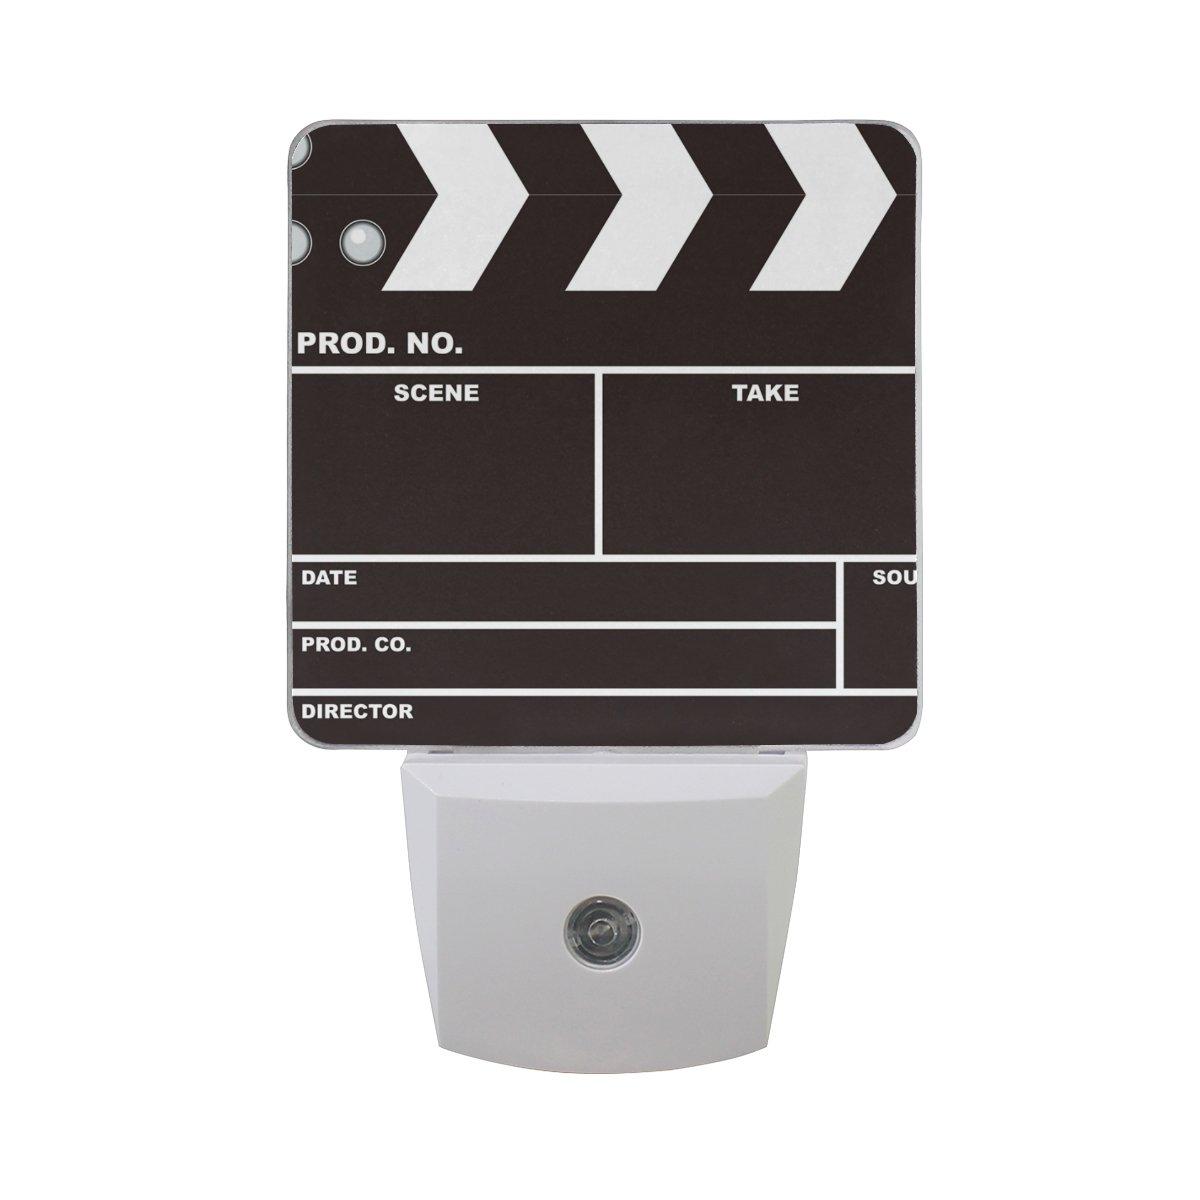 JOYPRINT Led Night Light Music Black Movie Clapboard, Auto Senor Dusk to Dawn Night Light Plug in for Kids Baby Girls Boys Adults Room